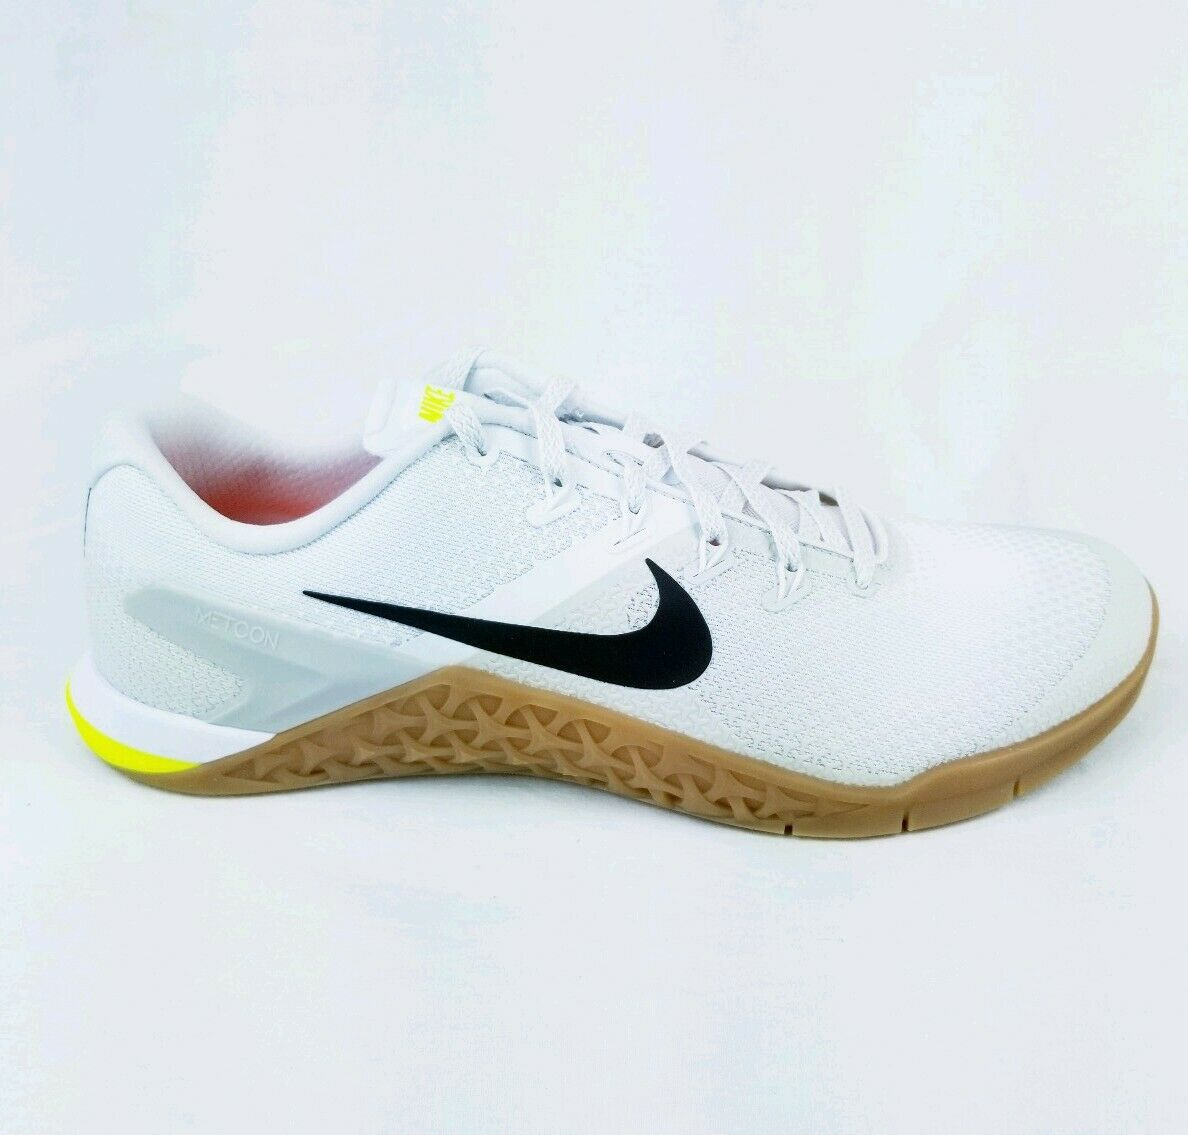 New Nike Metcon 4 Mens Training Cross Fit shoes Light Bone AH7453 100 Sz 11.5